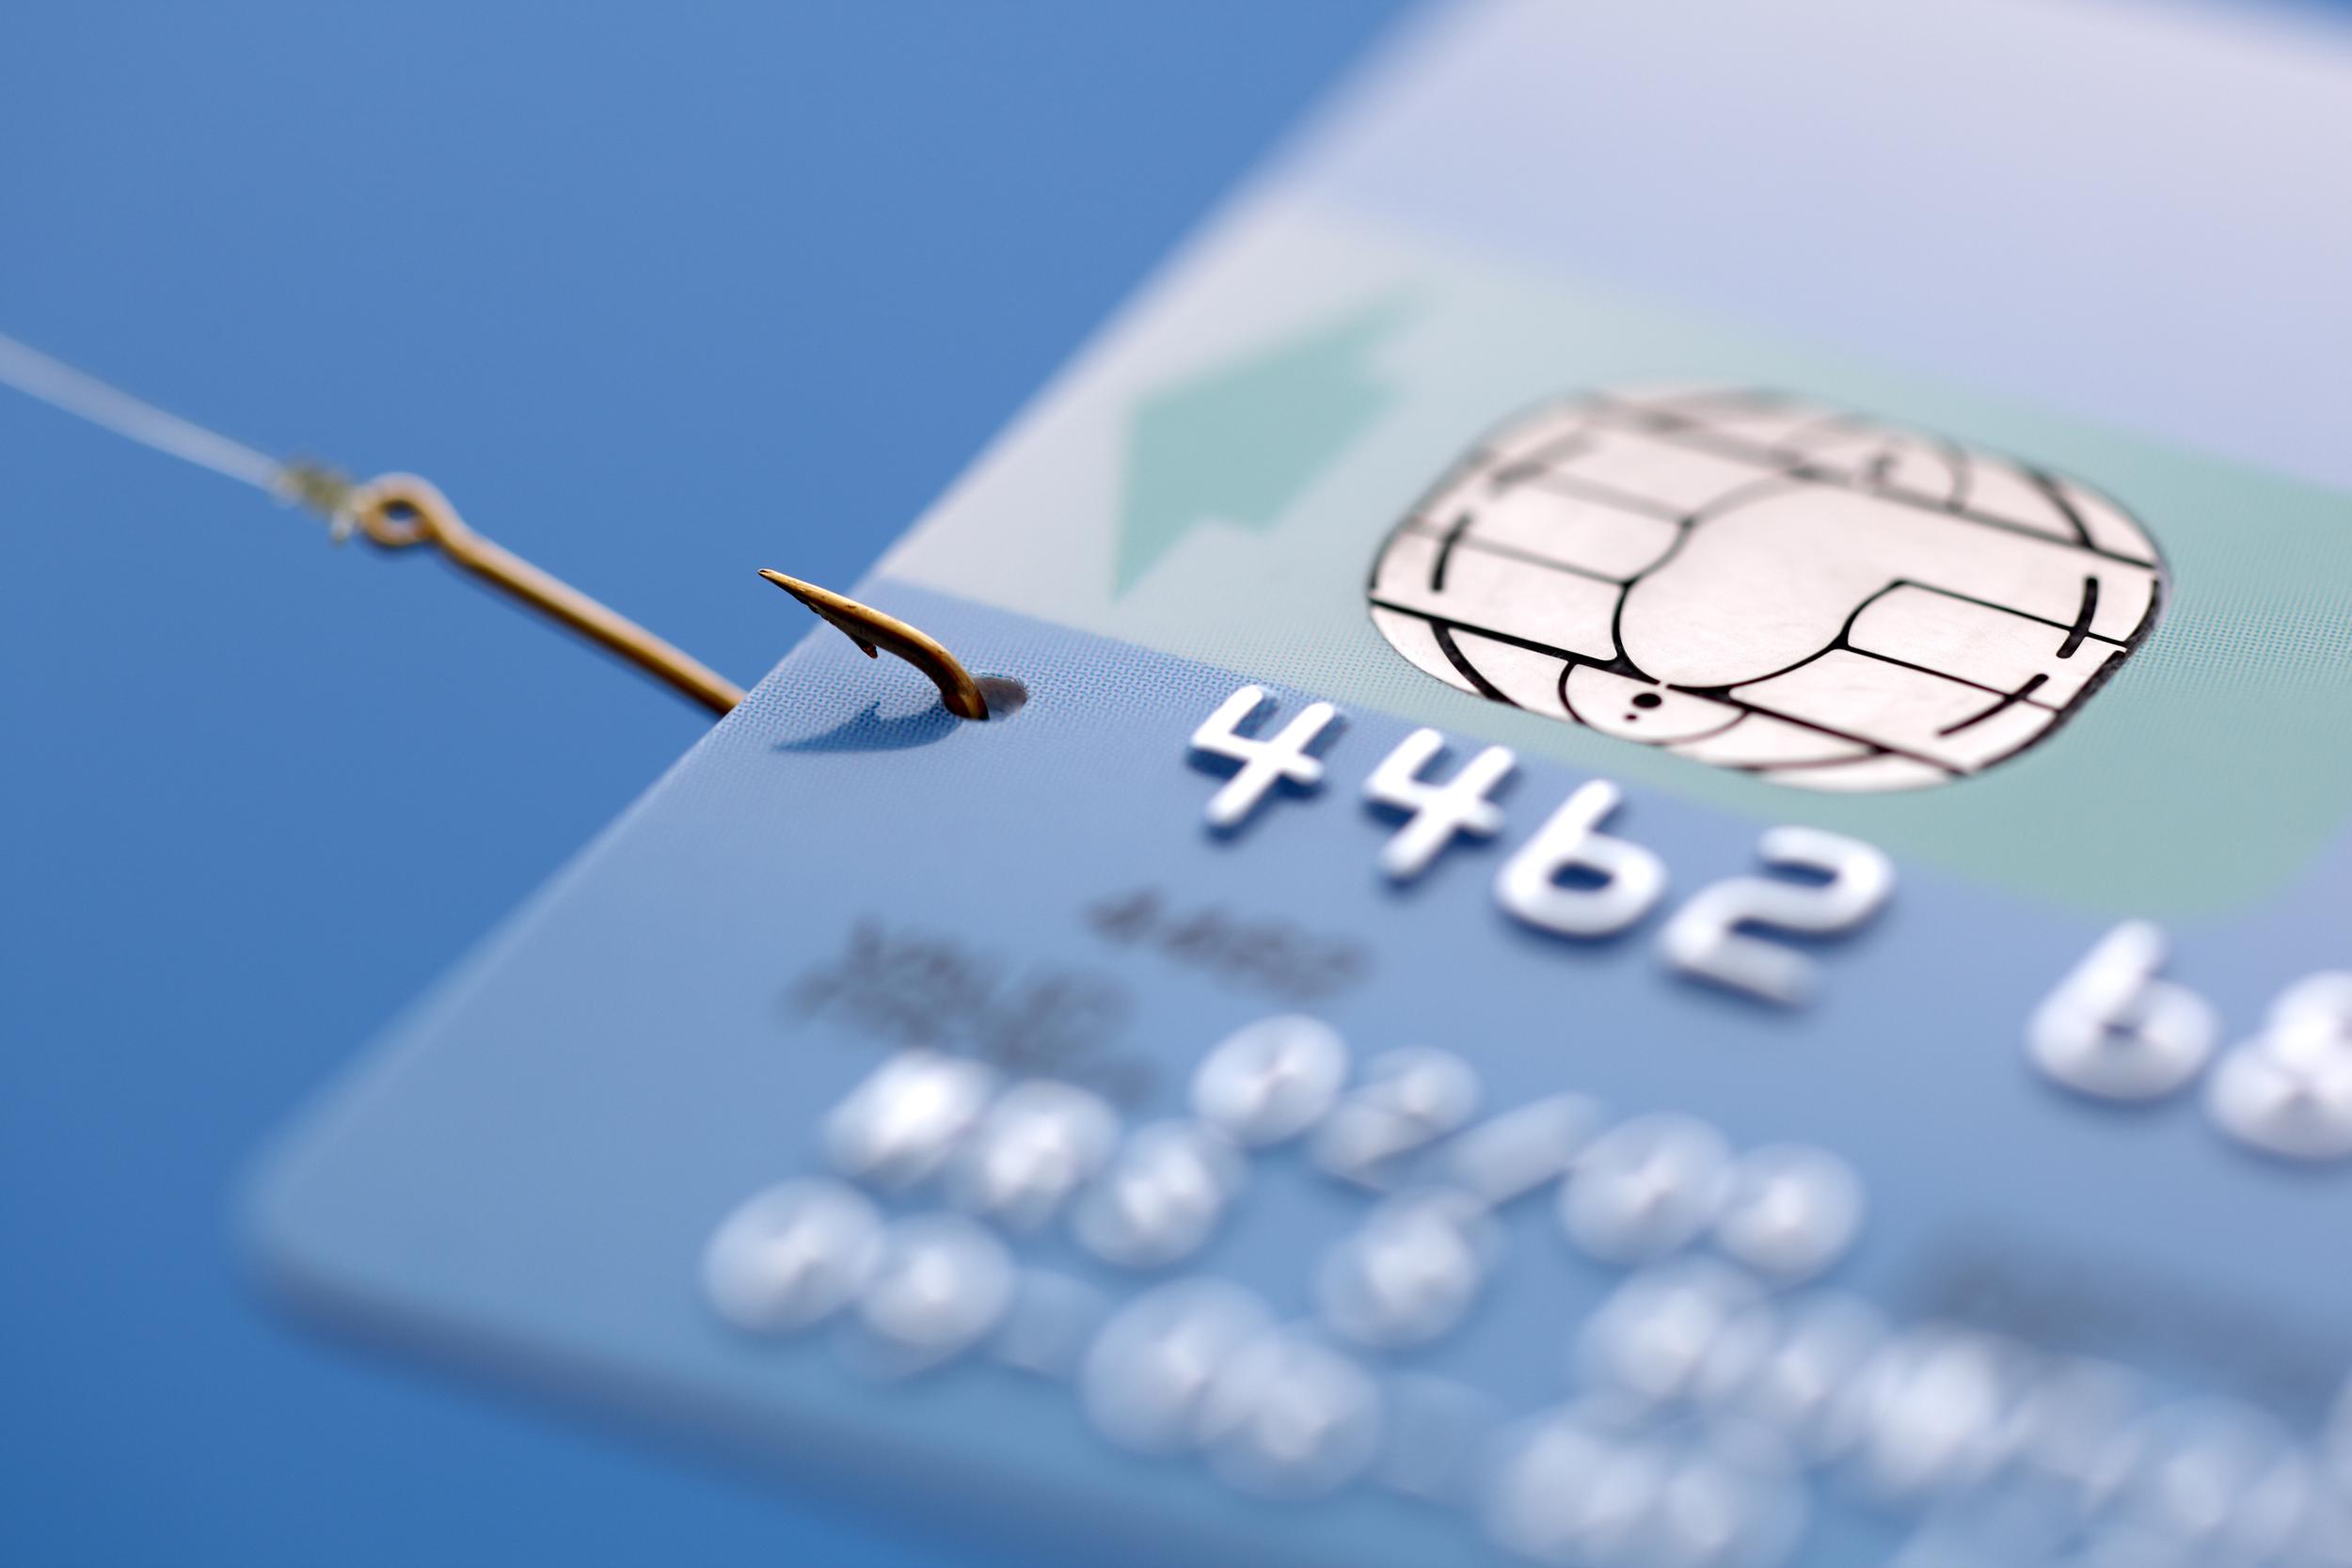 bigstock-Credit-card-caught-on-a-fishin-16554041.jpg